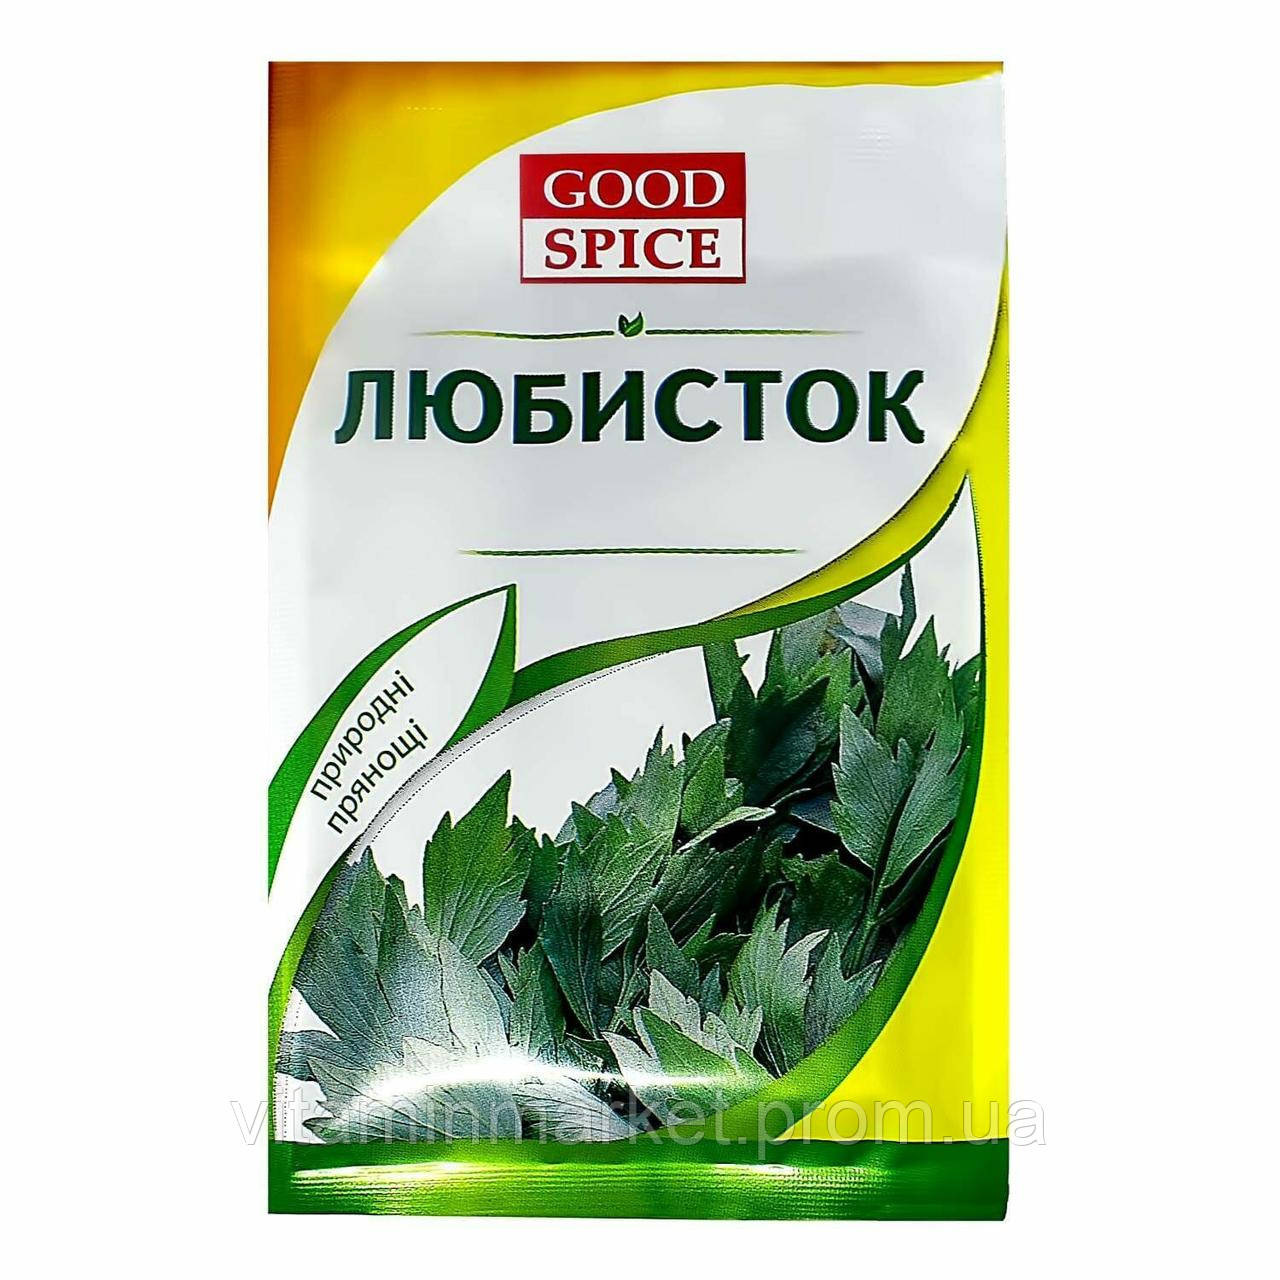 Любисток целый, «Good Spice», 6 гр.